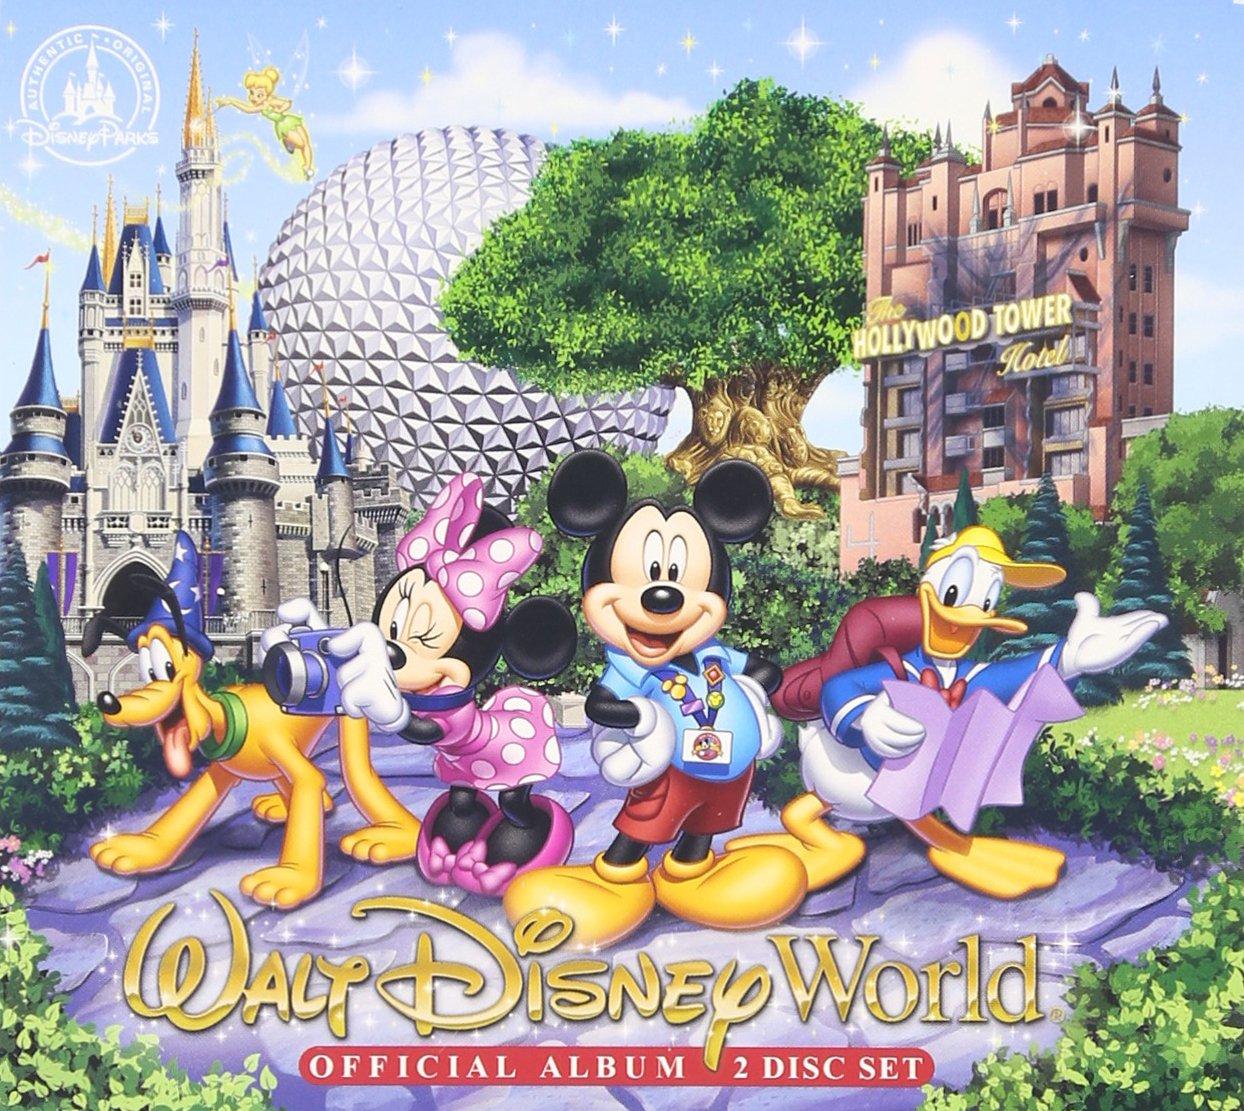 Walt Disney World Official Album, New Release